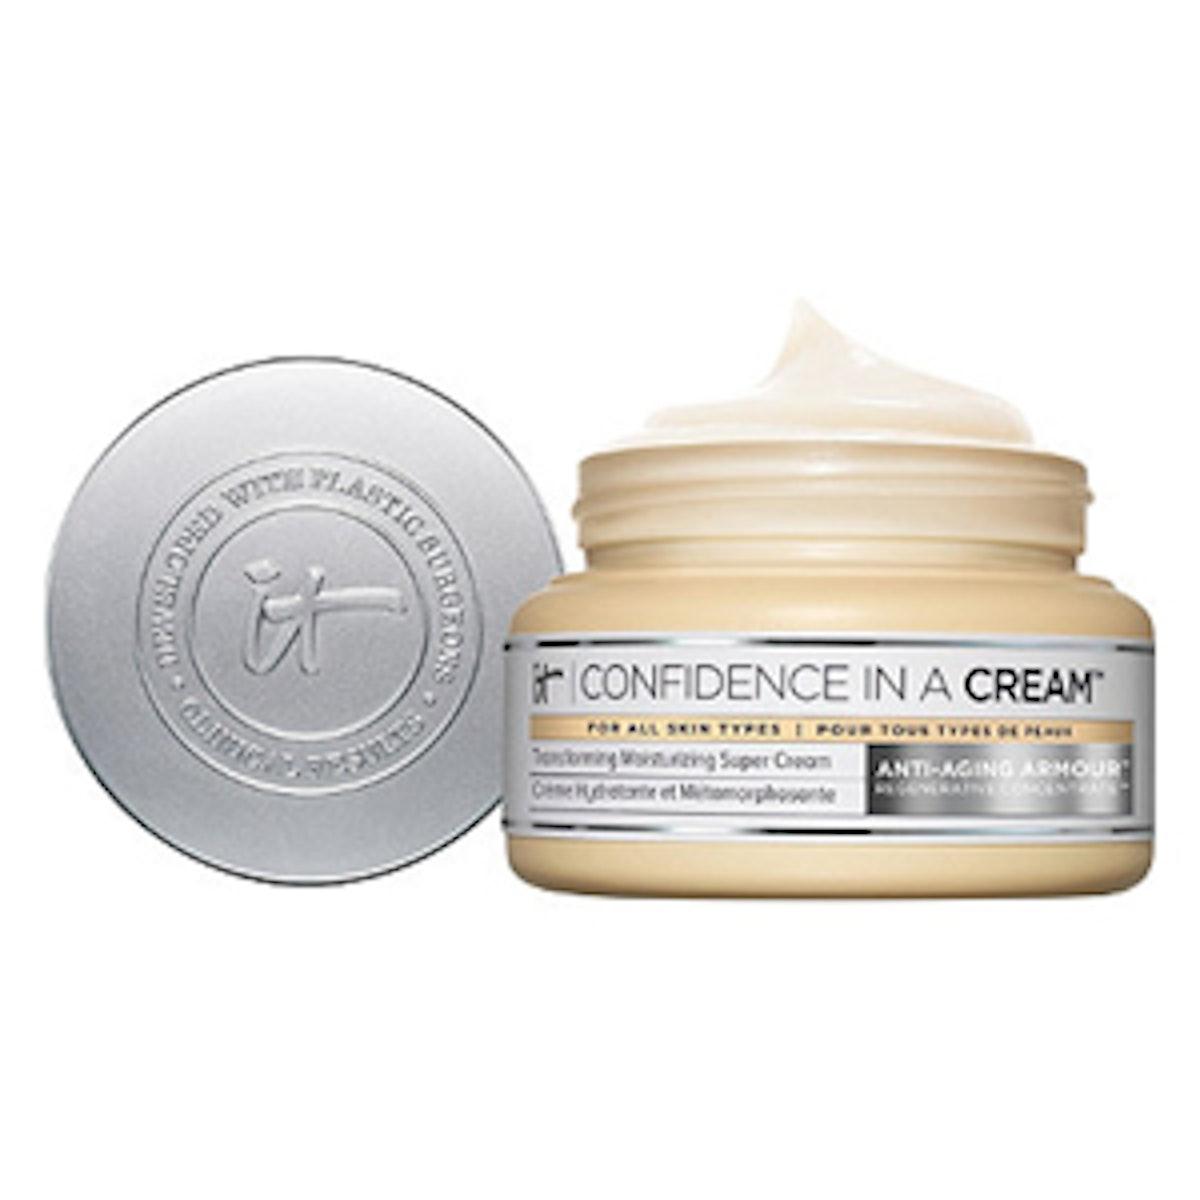 Confidence in a Cream Transforming Moisturizing Super Cream